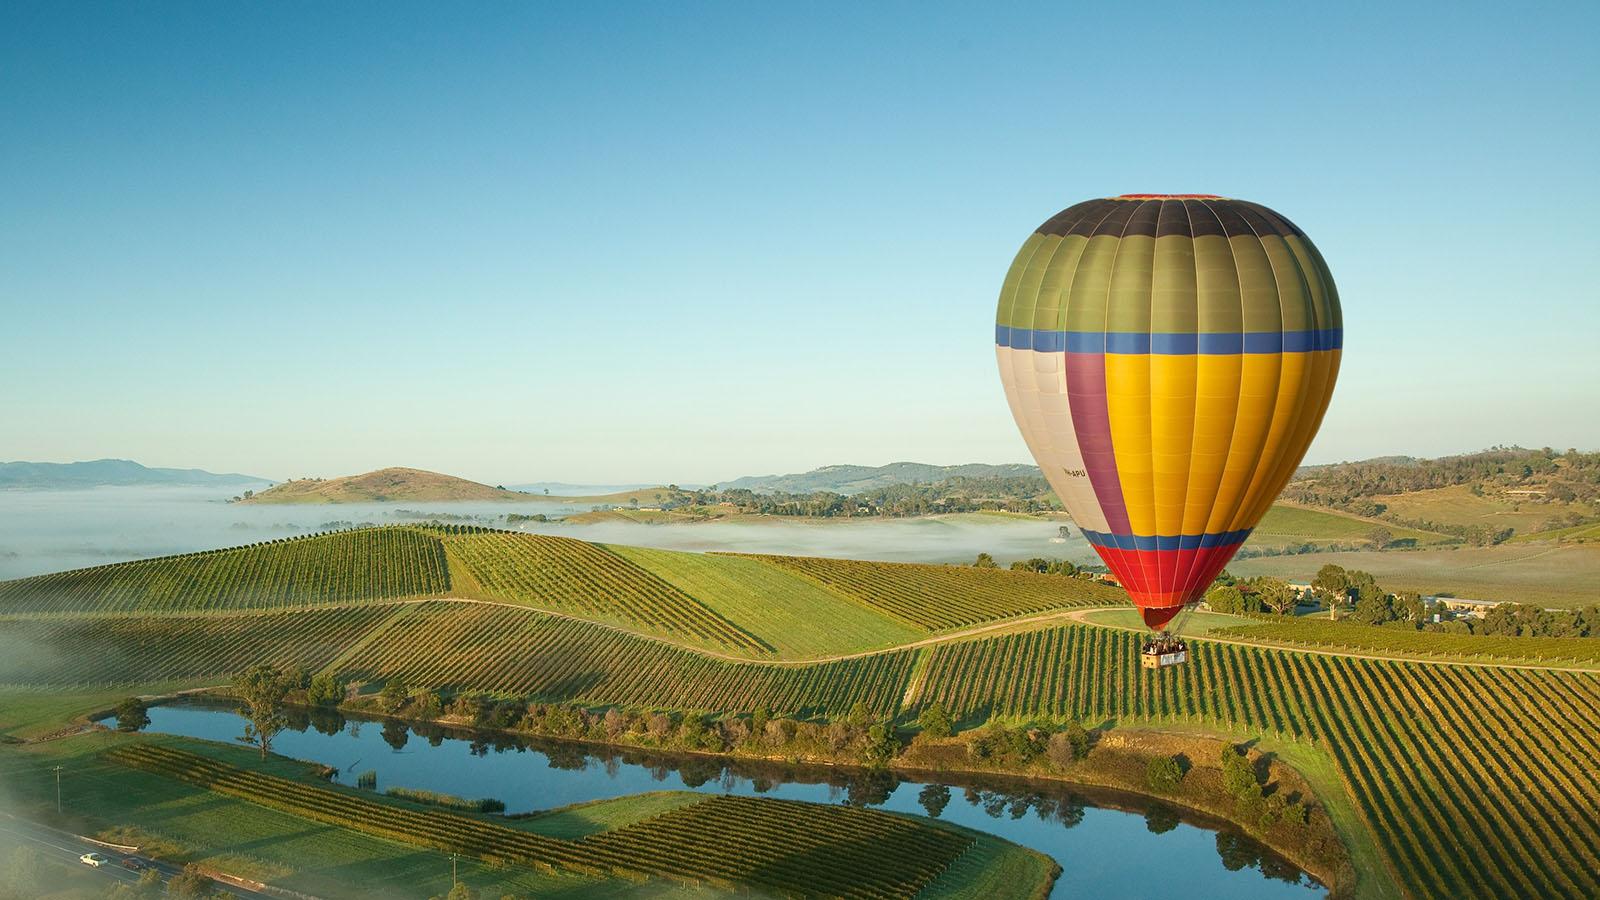 Ballooning over Yarra Valley, Yarra Valley & Dandenong Ranges, Victoria, Australia